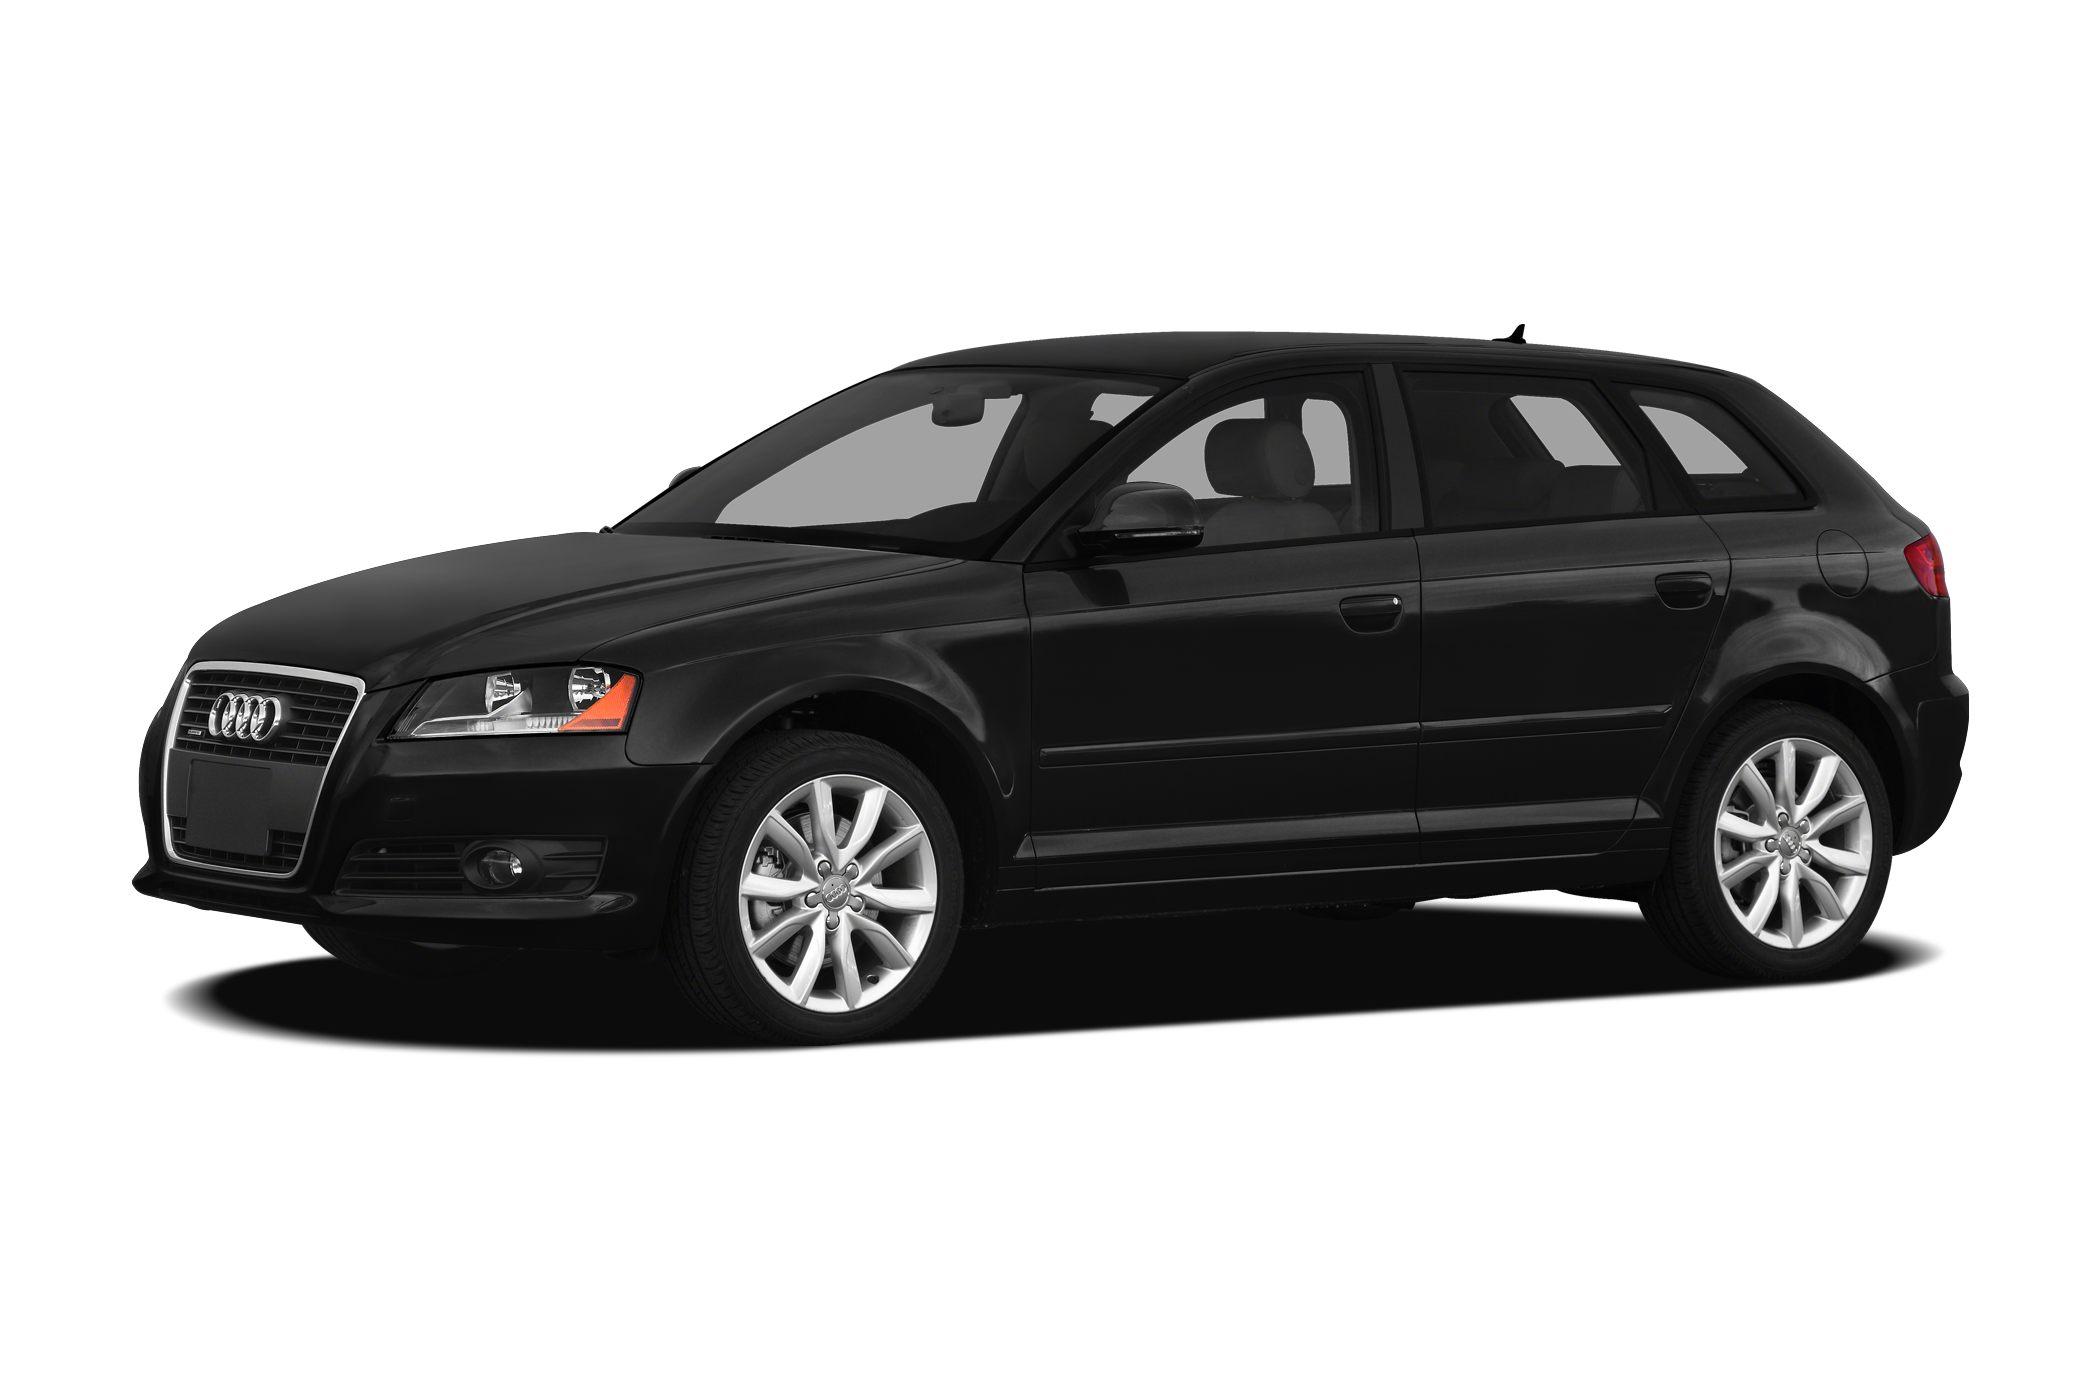 2012 Audi A3 Information